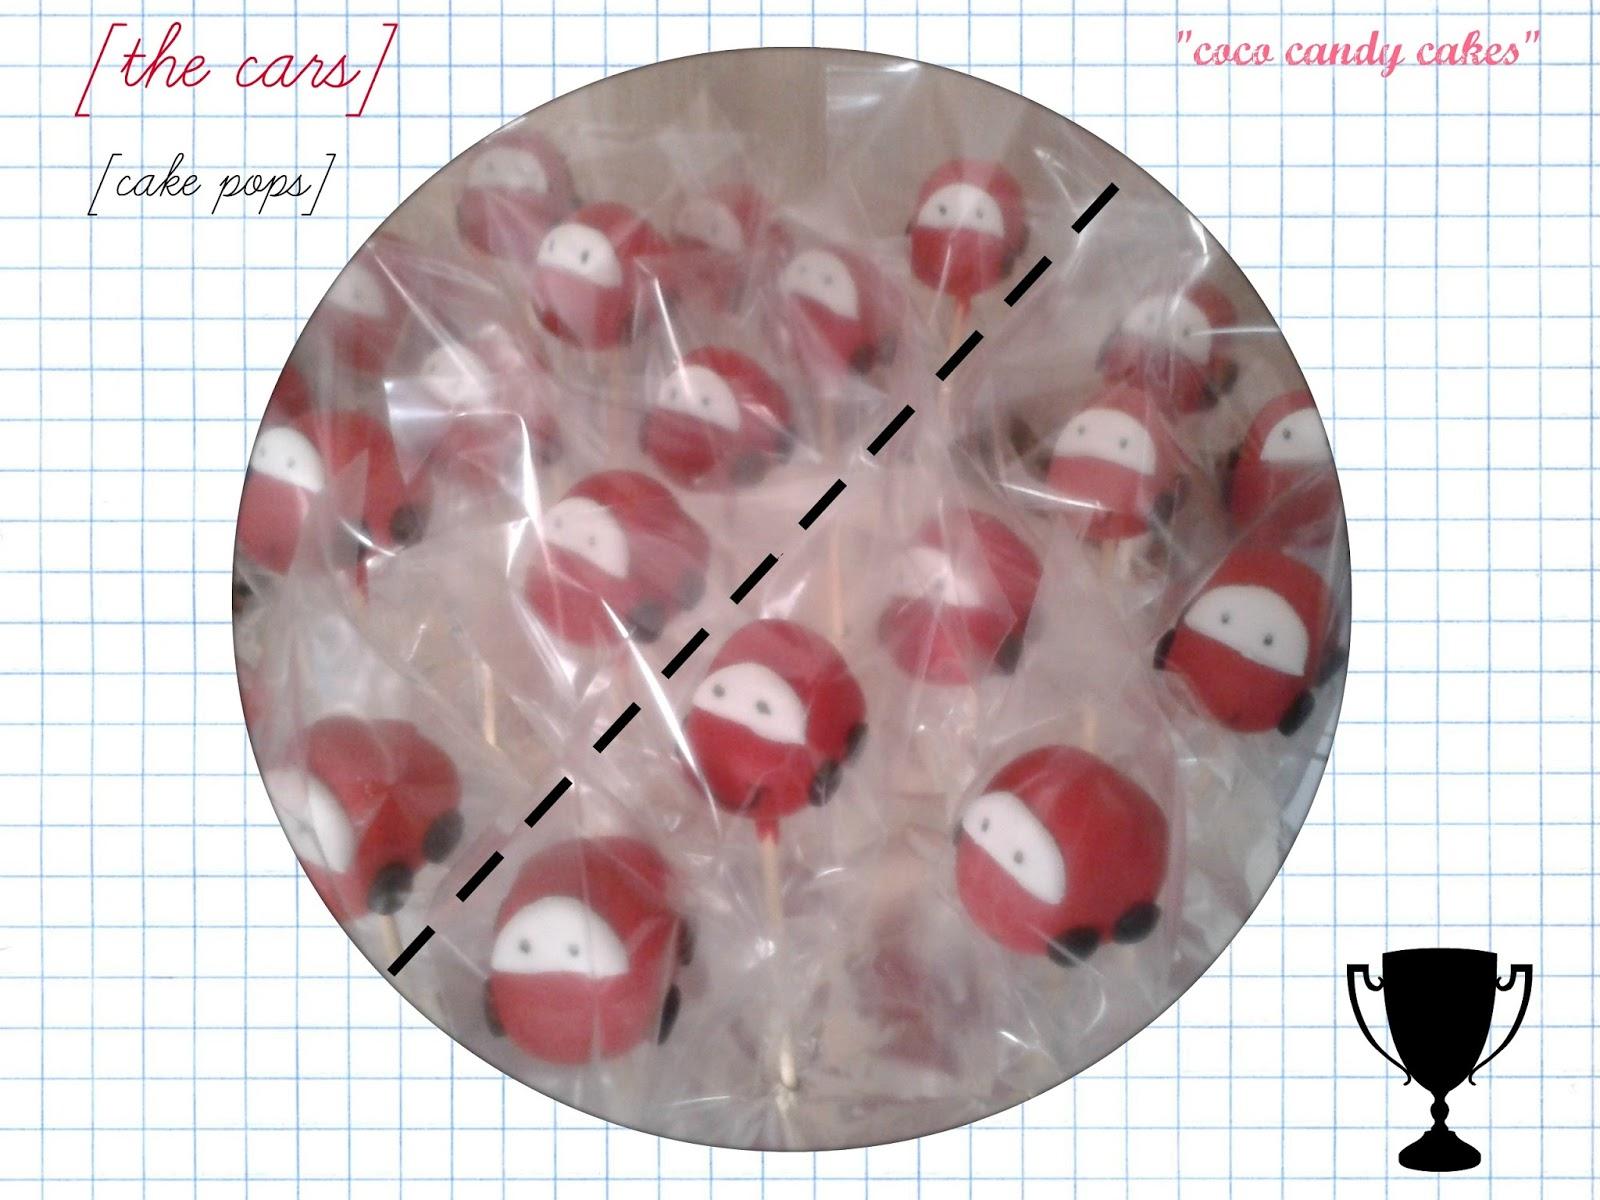 Valencia Candy Doll